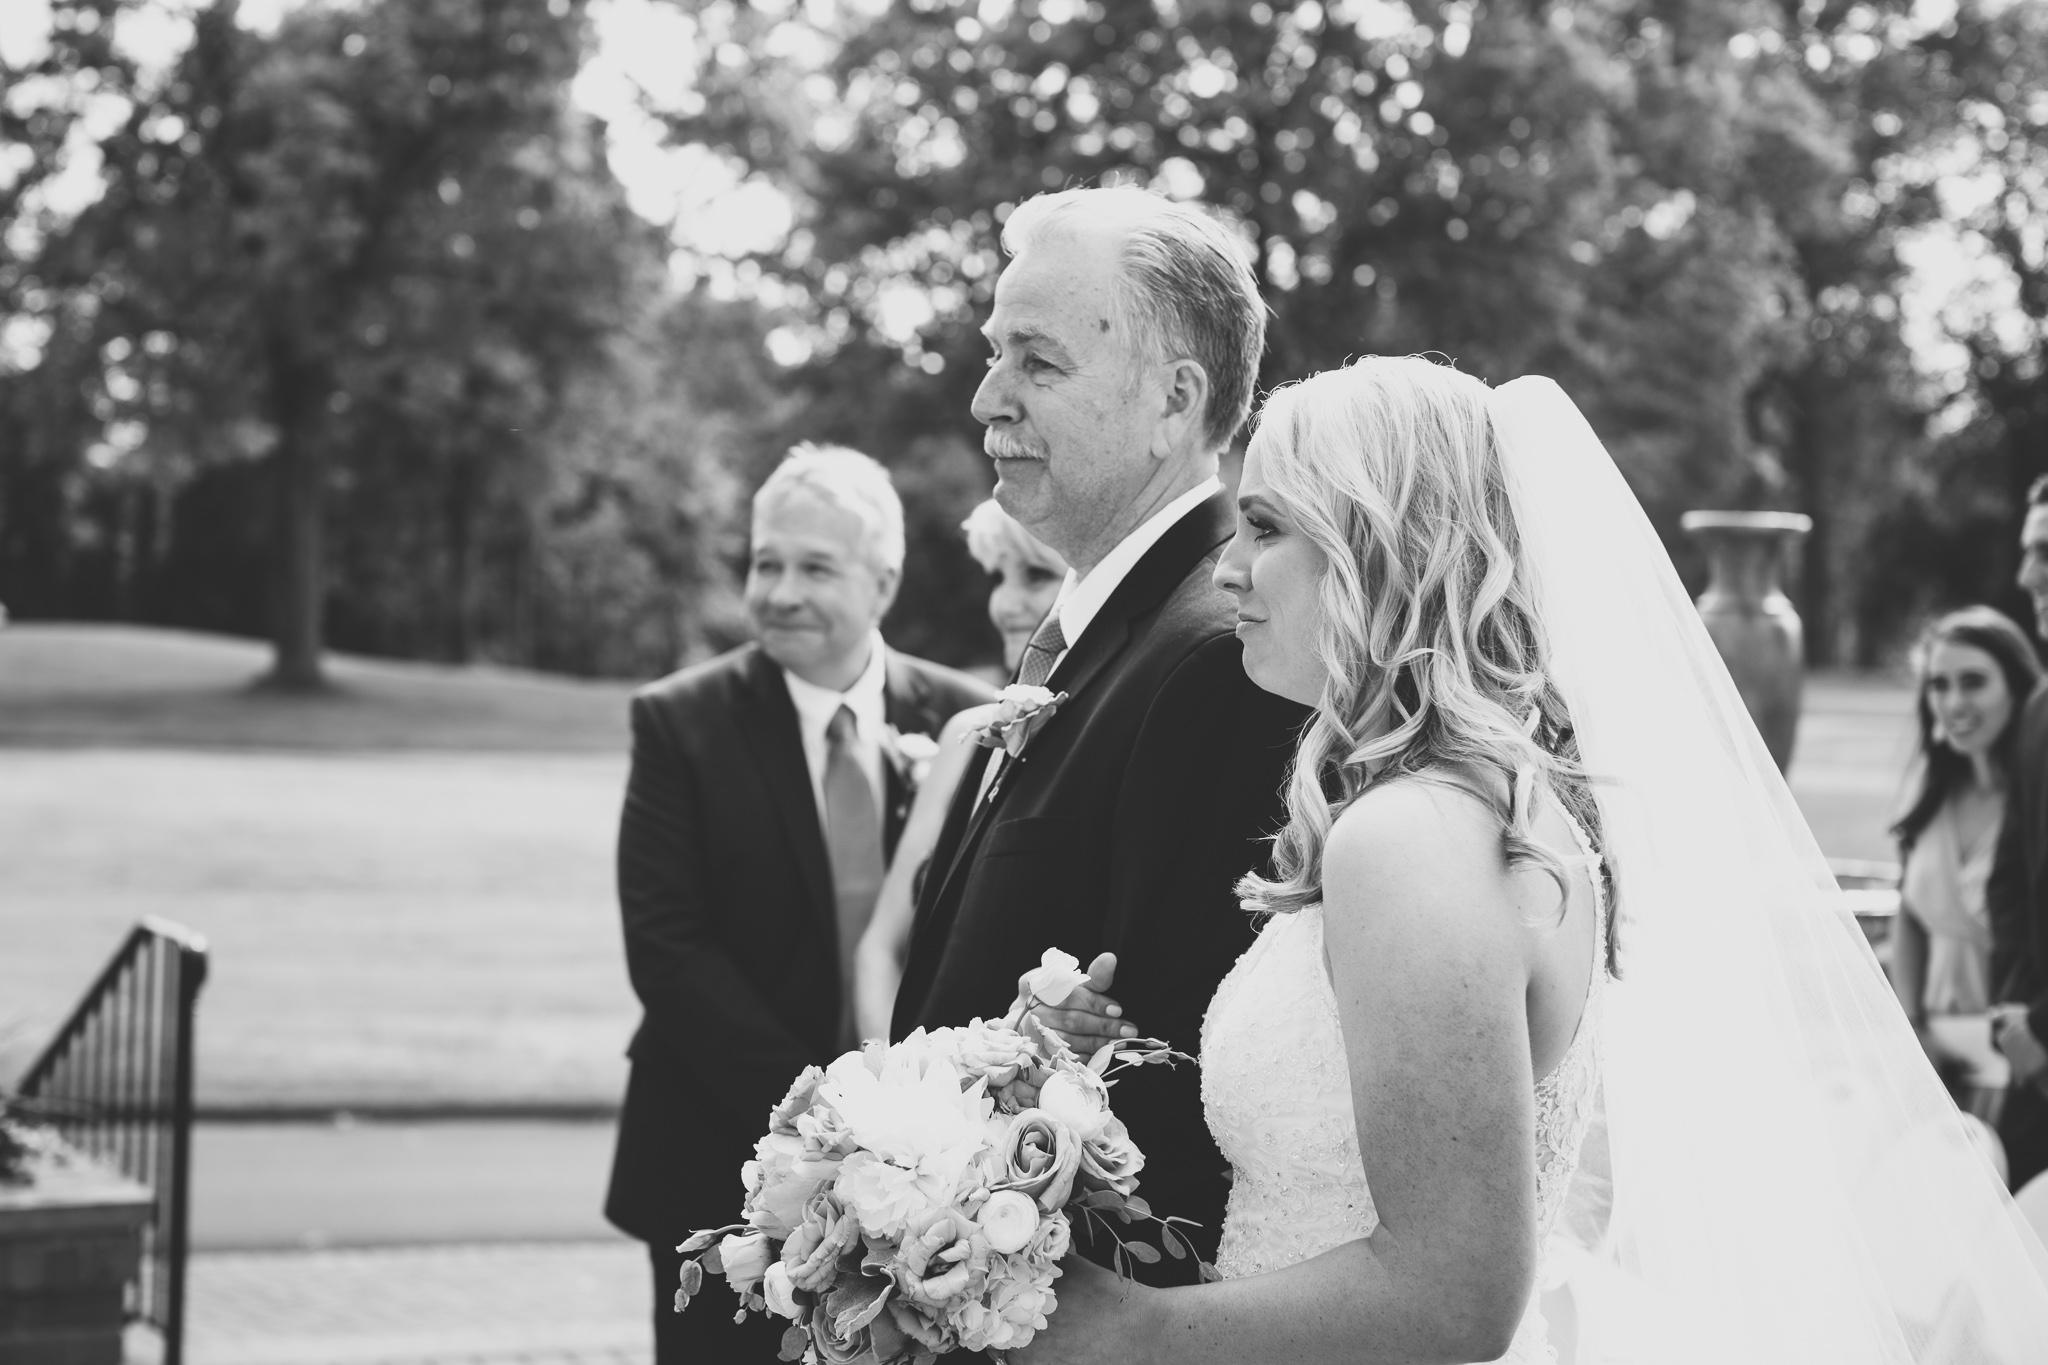 076-best-detroit-michigan-outdoor-wedding-photographer.jpg